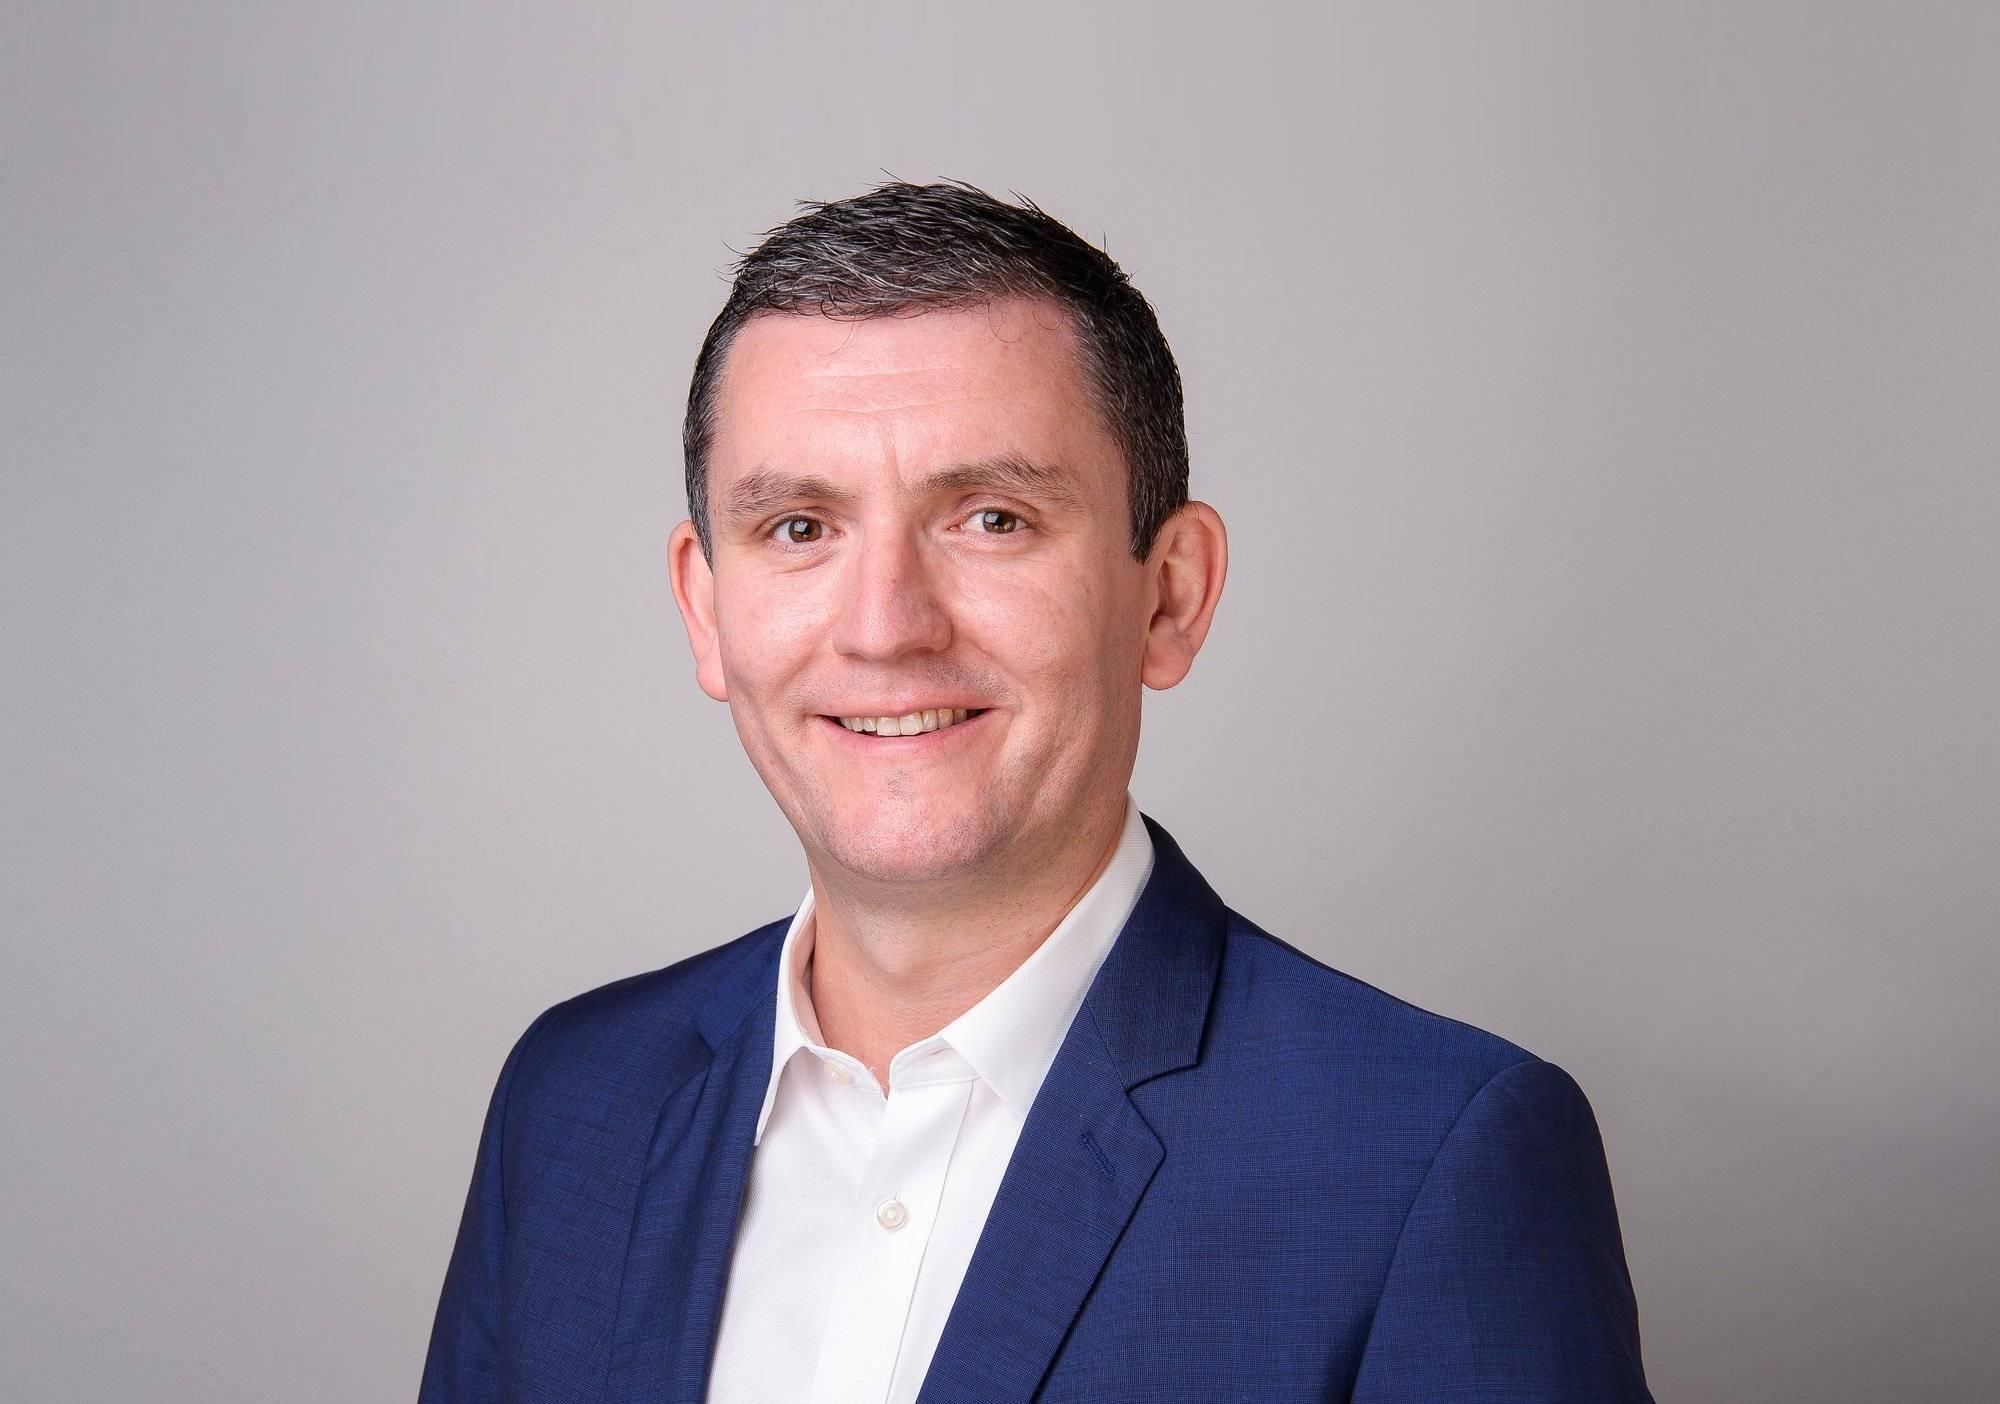 Martin Farrell, Managing Director